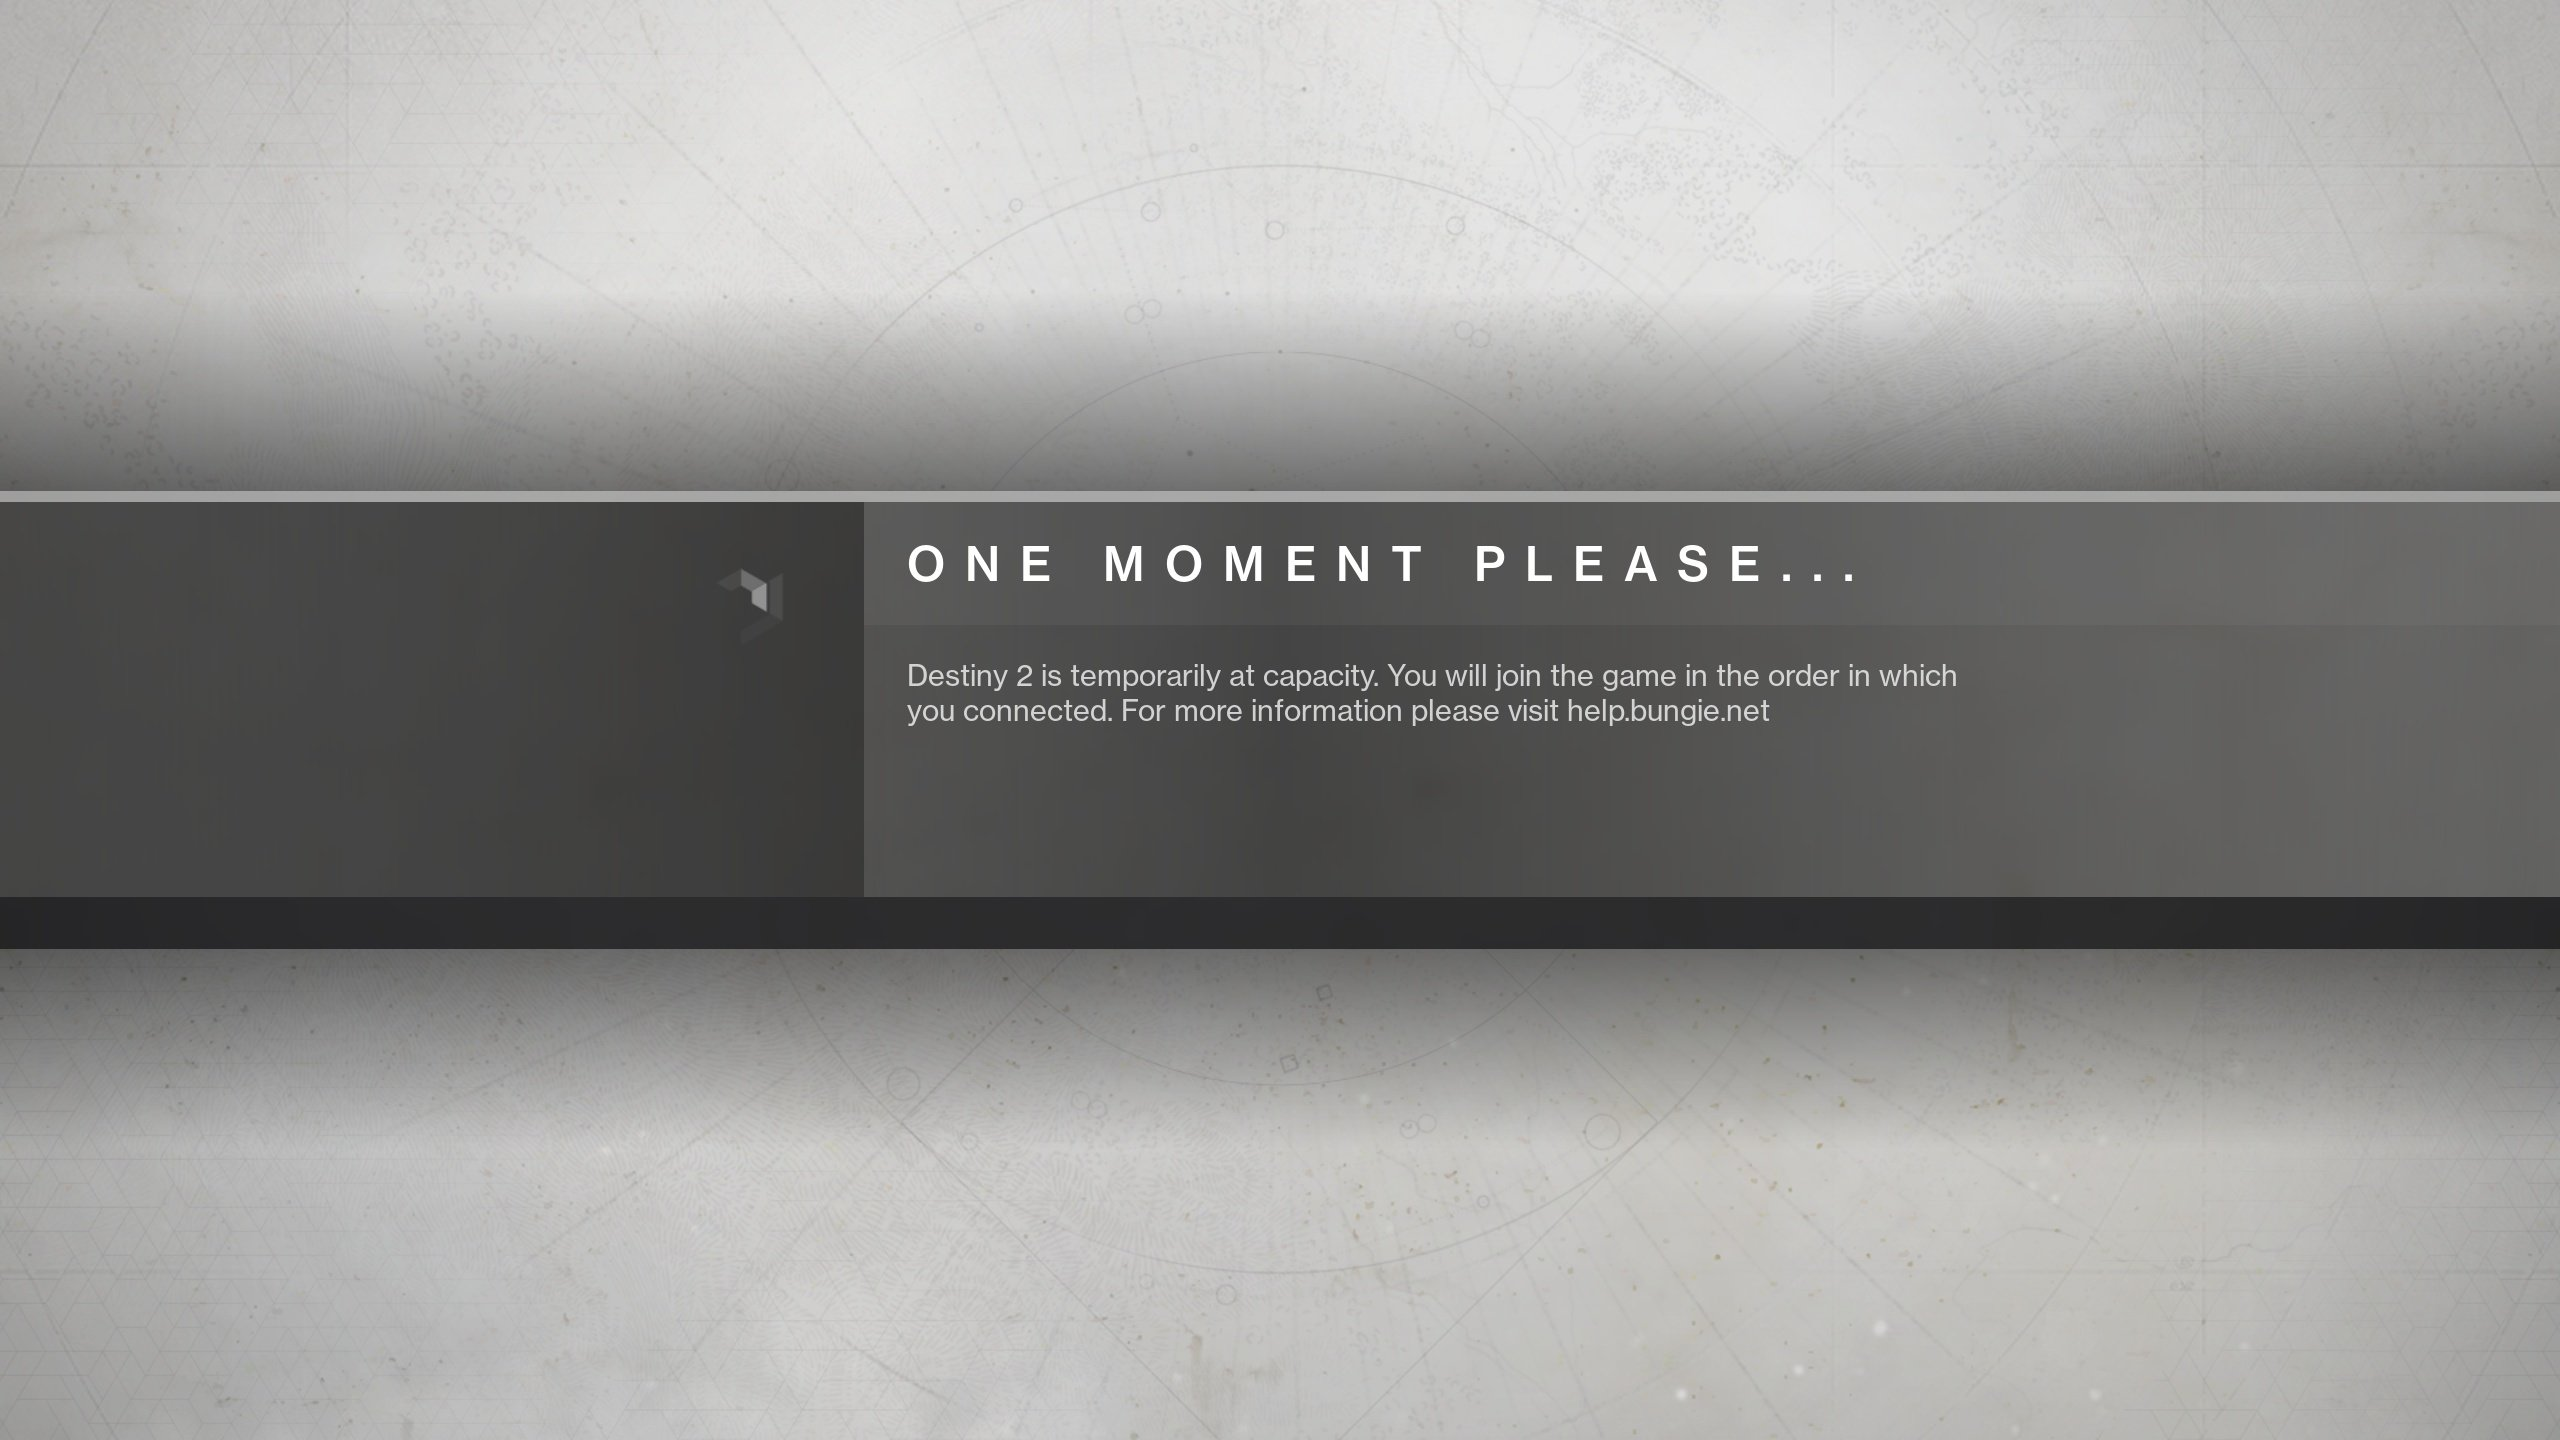 Destiny 2 servers temporarily at capacity